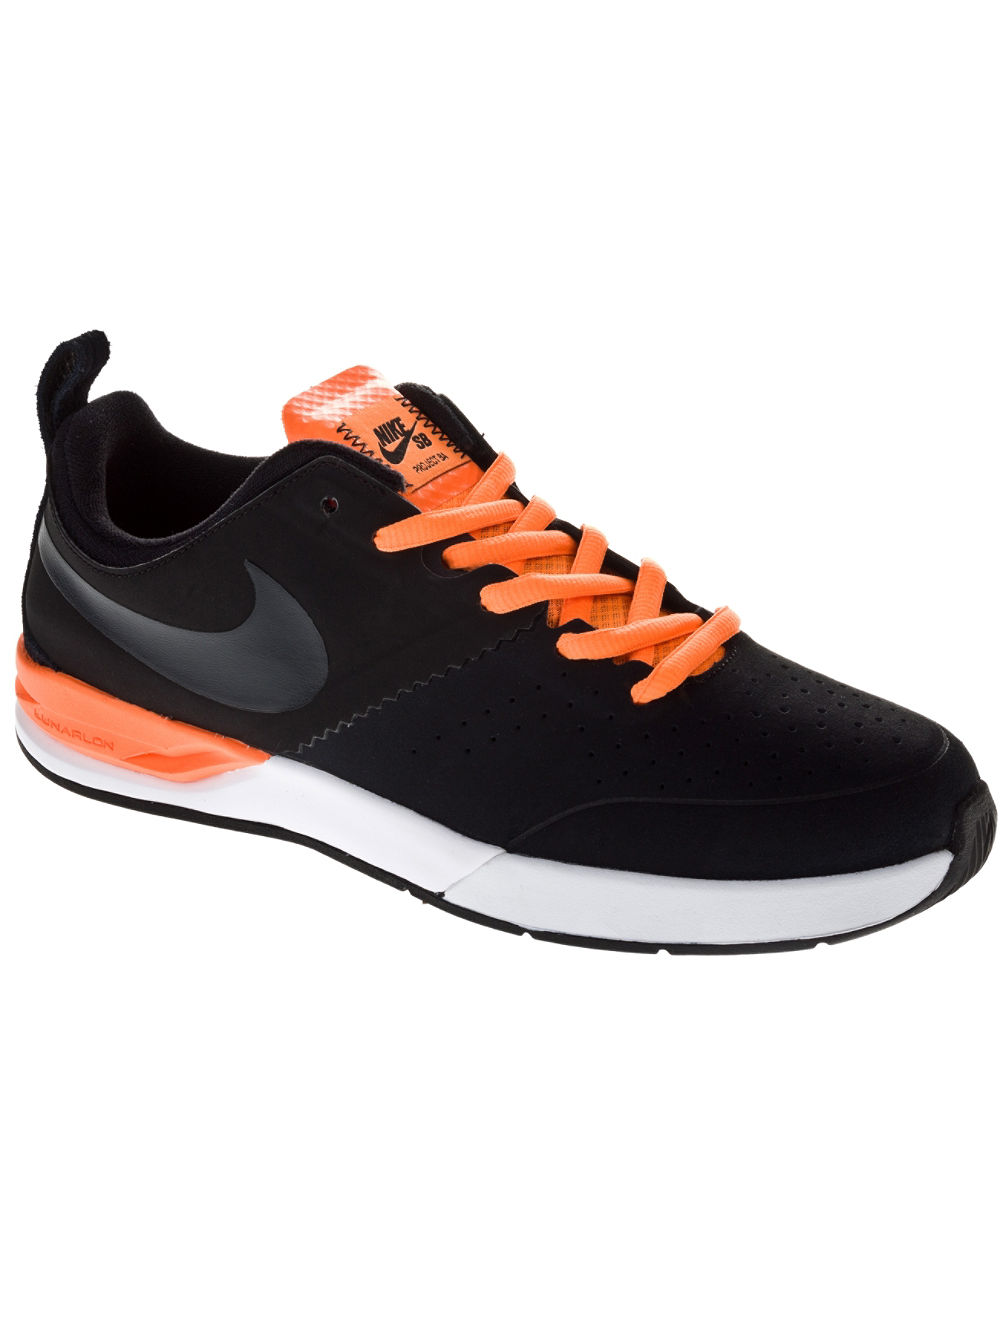 Nike Project BA Skate Shoes - nike - blue-tomato.com